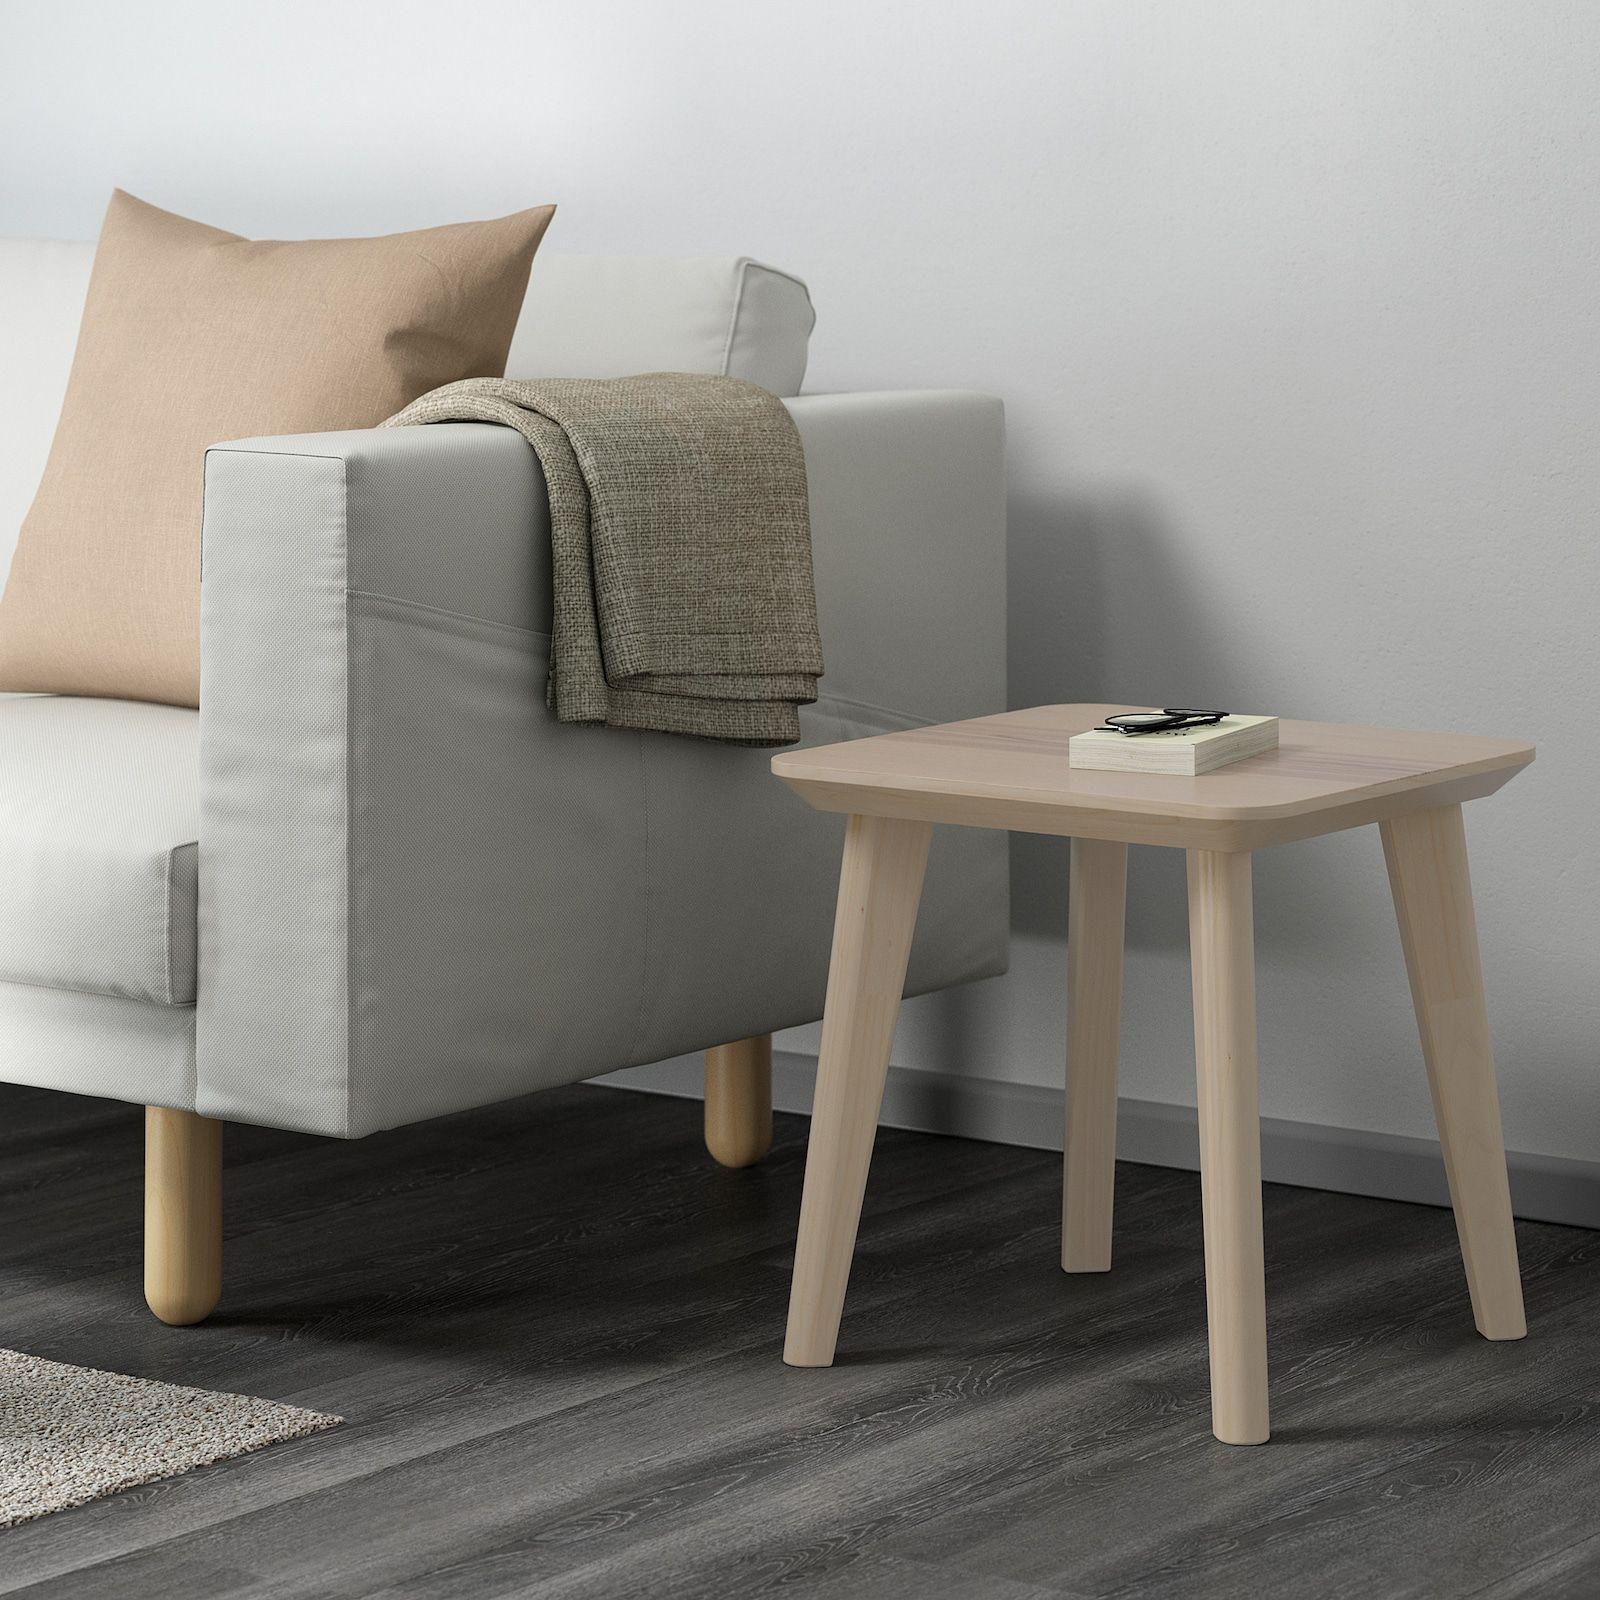 Lisabo Side Table Ash Veneer Ikea In 2020 Furniture Styles Ikea Side Table Side Table [ 1600 x 1600 Pixel ]